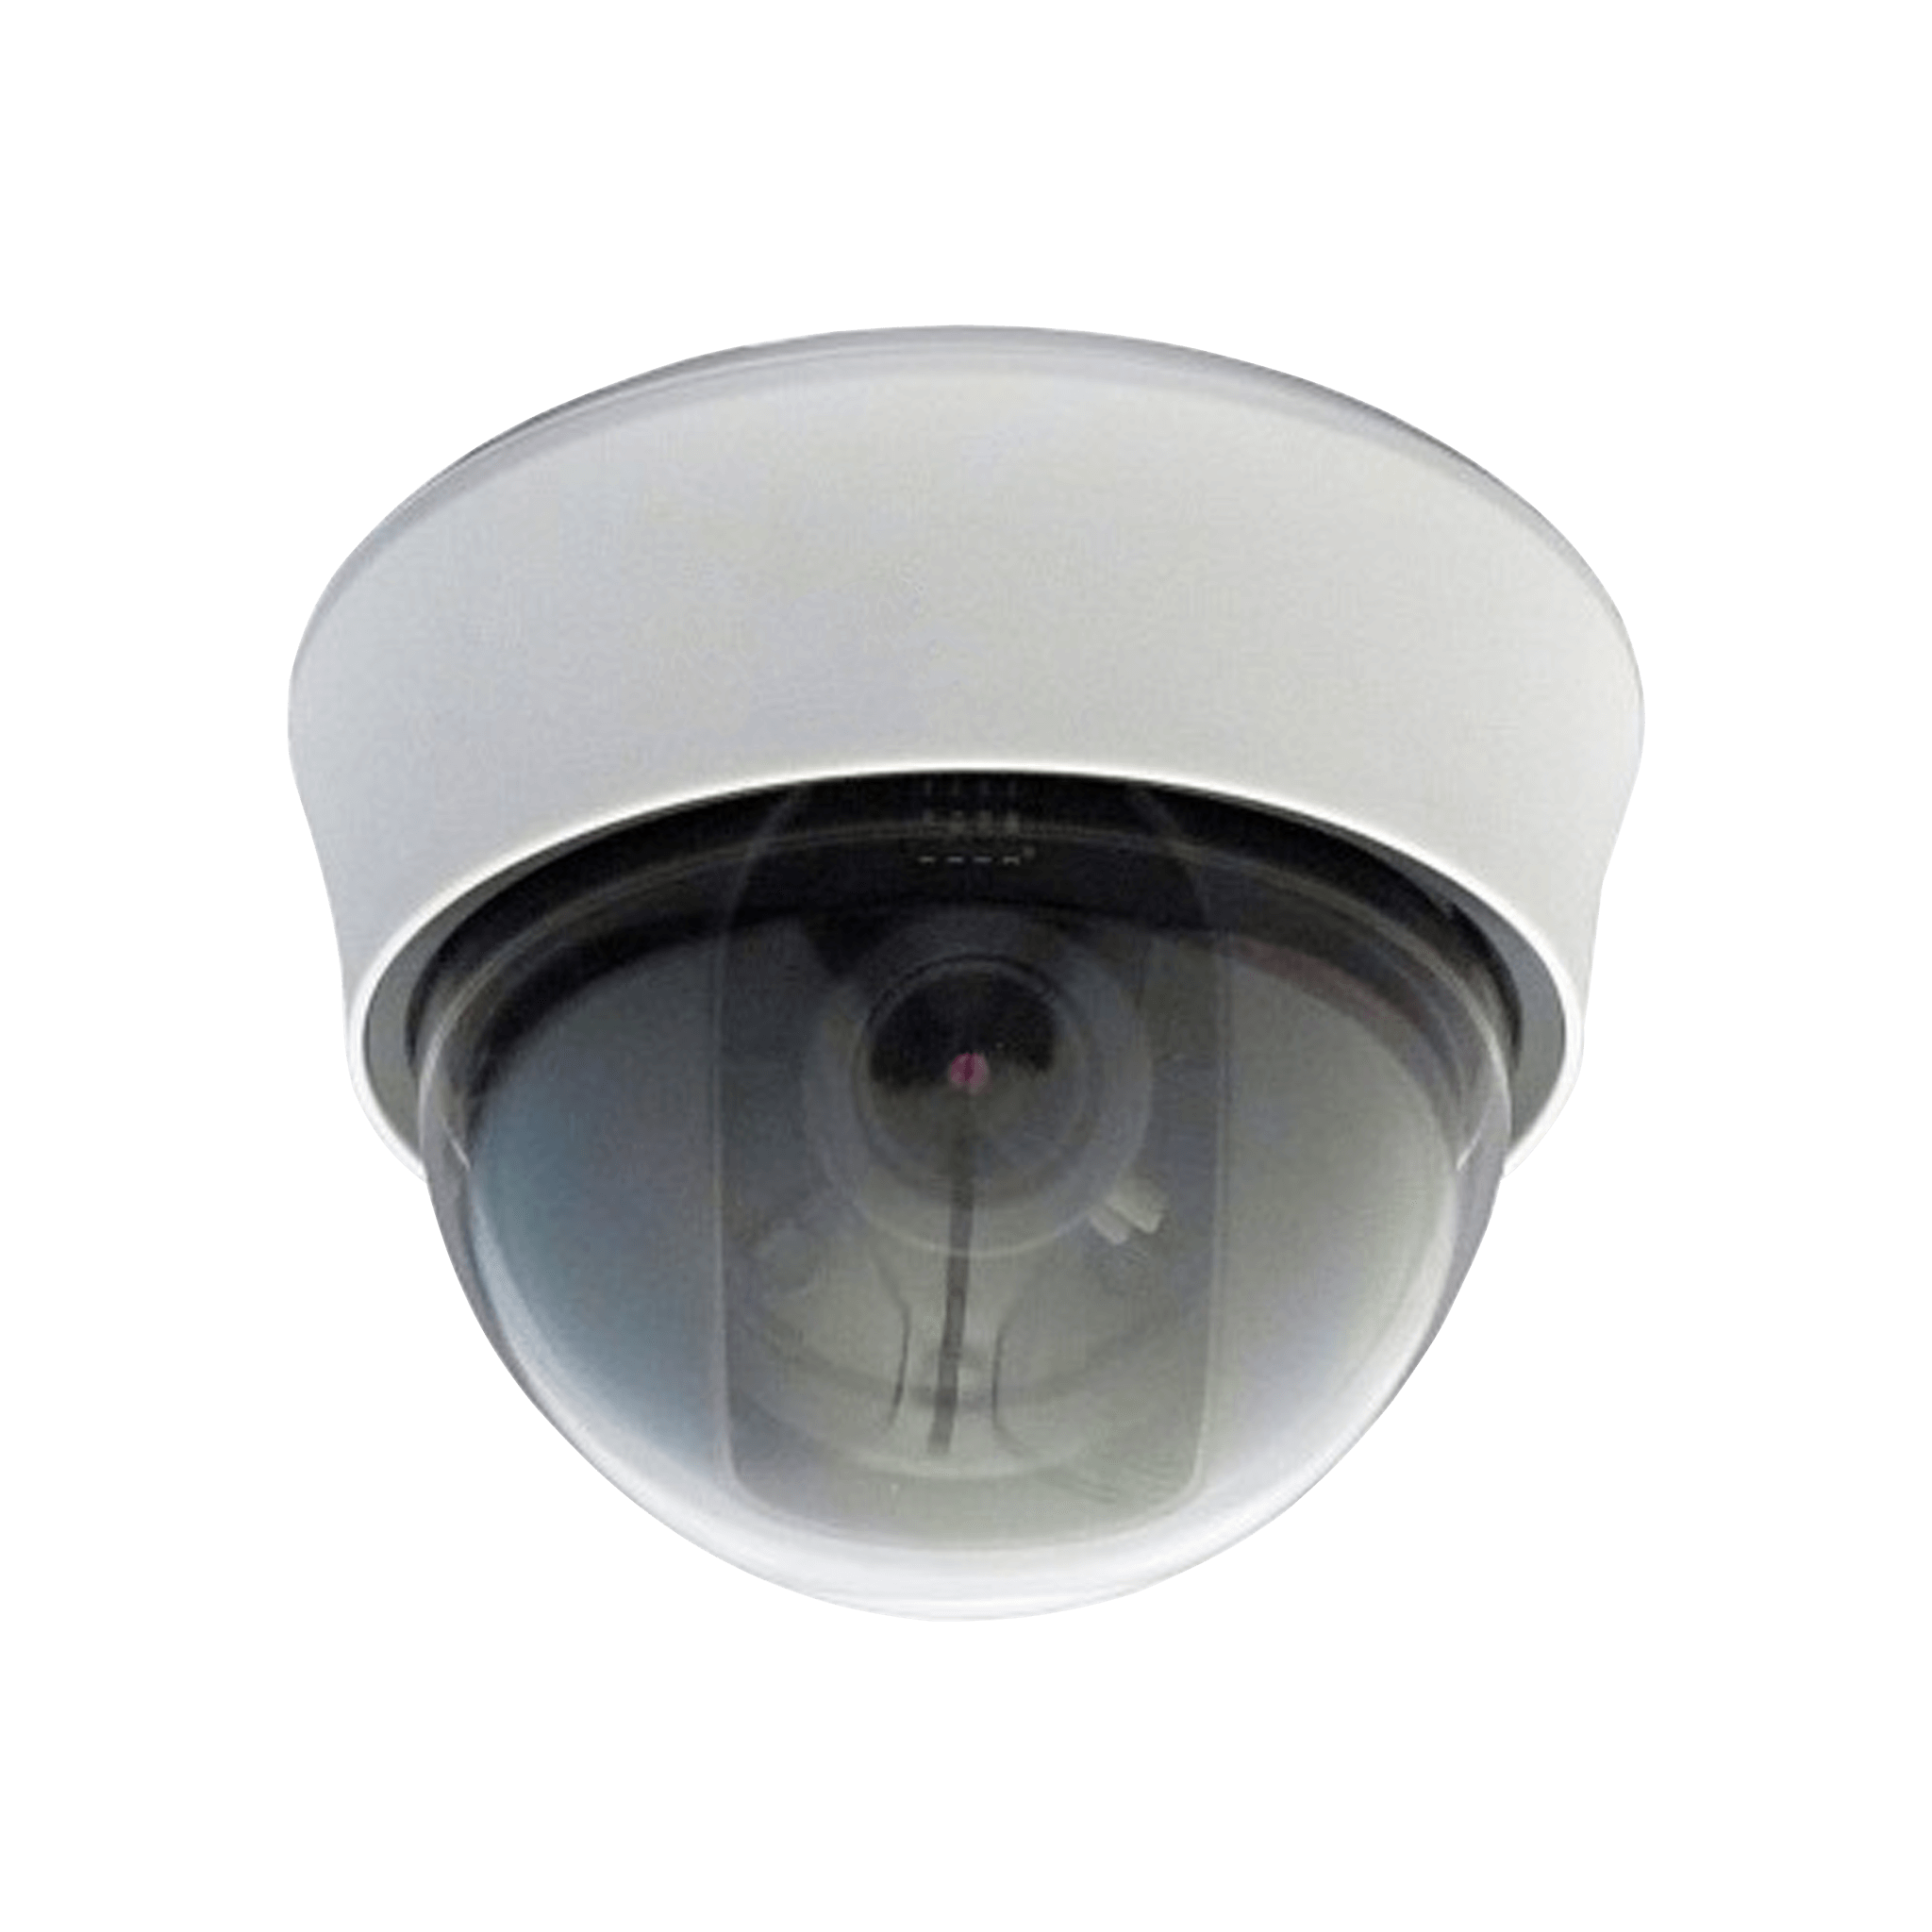 High Resolution Internal Dome Camera Webeye Catalogue